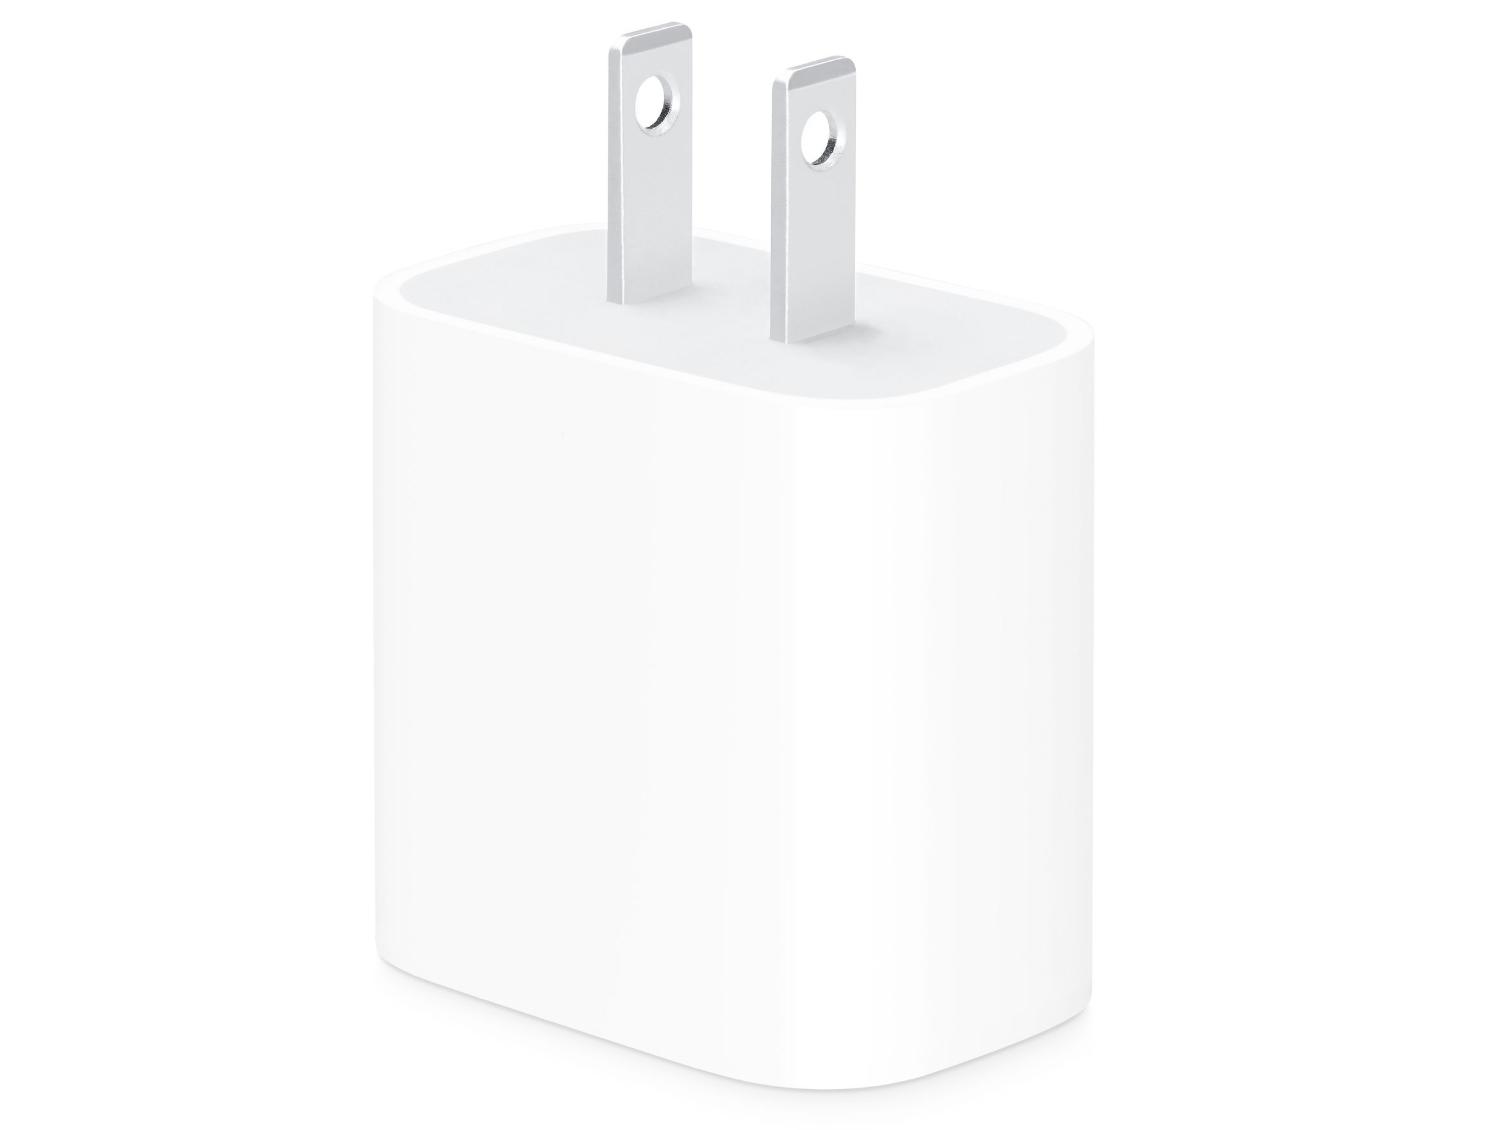 Apple USB-C wall adapter